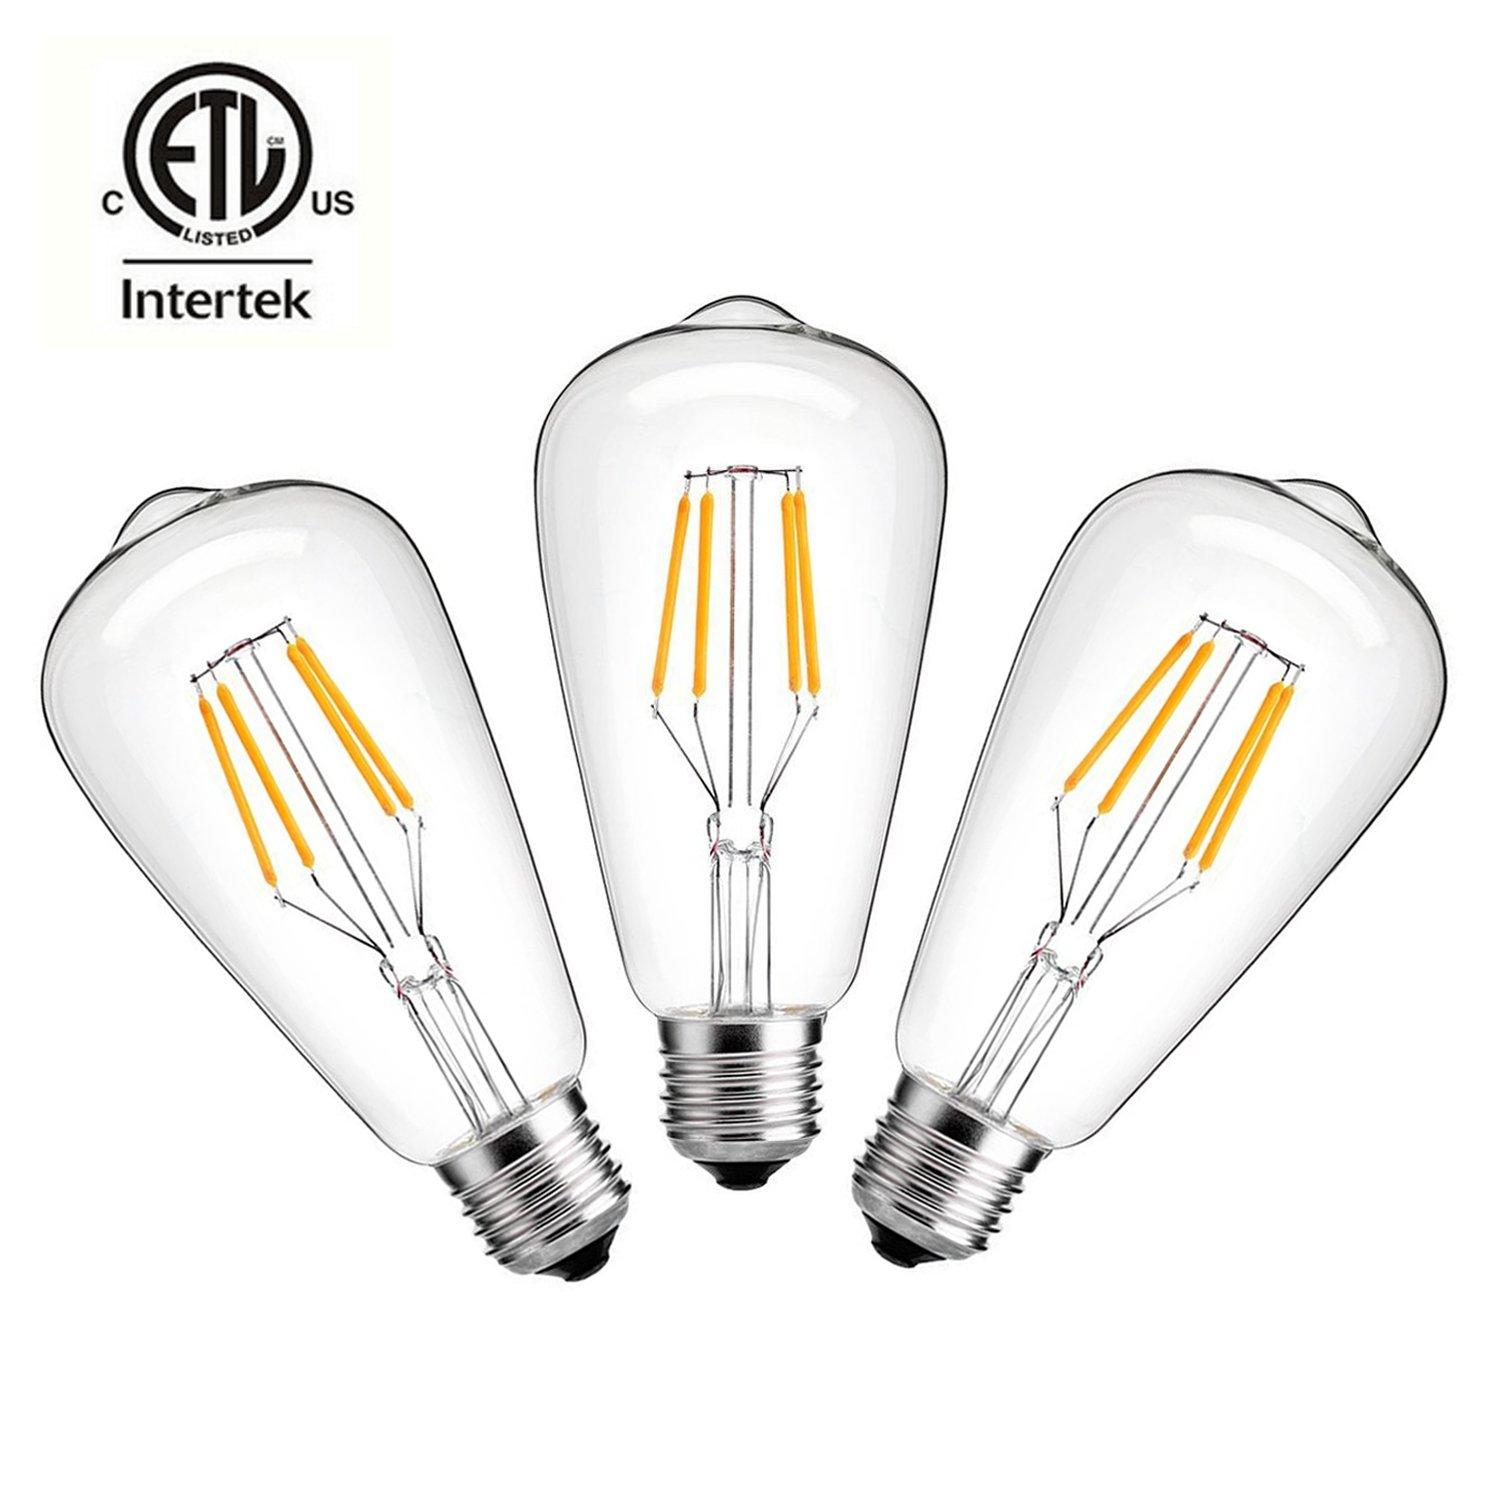 CMYK LEDエジソン電球 調光可能 ST64形 ビンテージ 透明 4W 50W相当 2200K E26ベース B01DDDNE1W 4W 6  4W